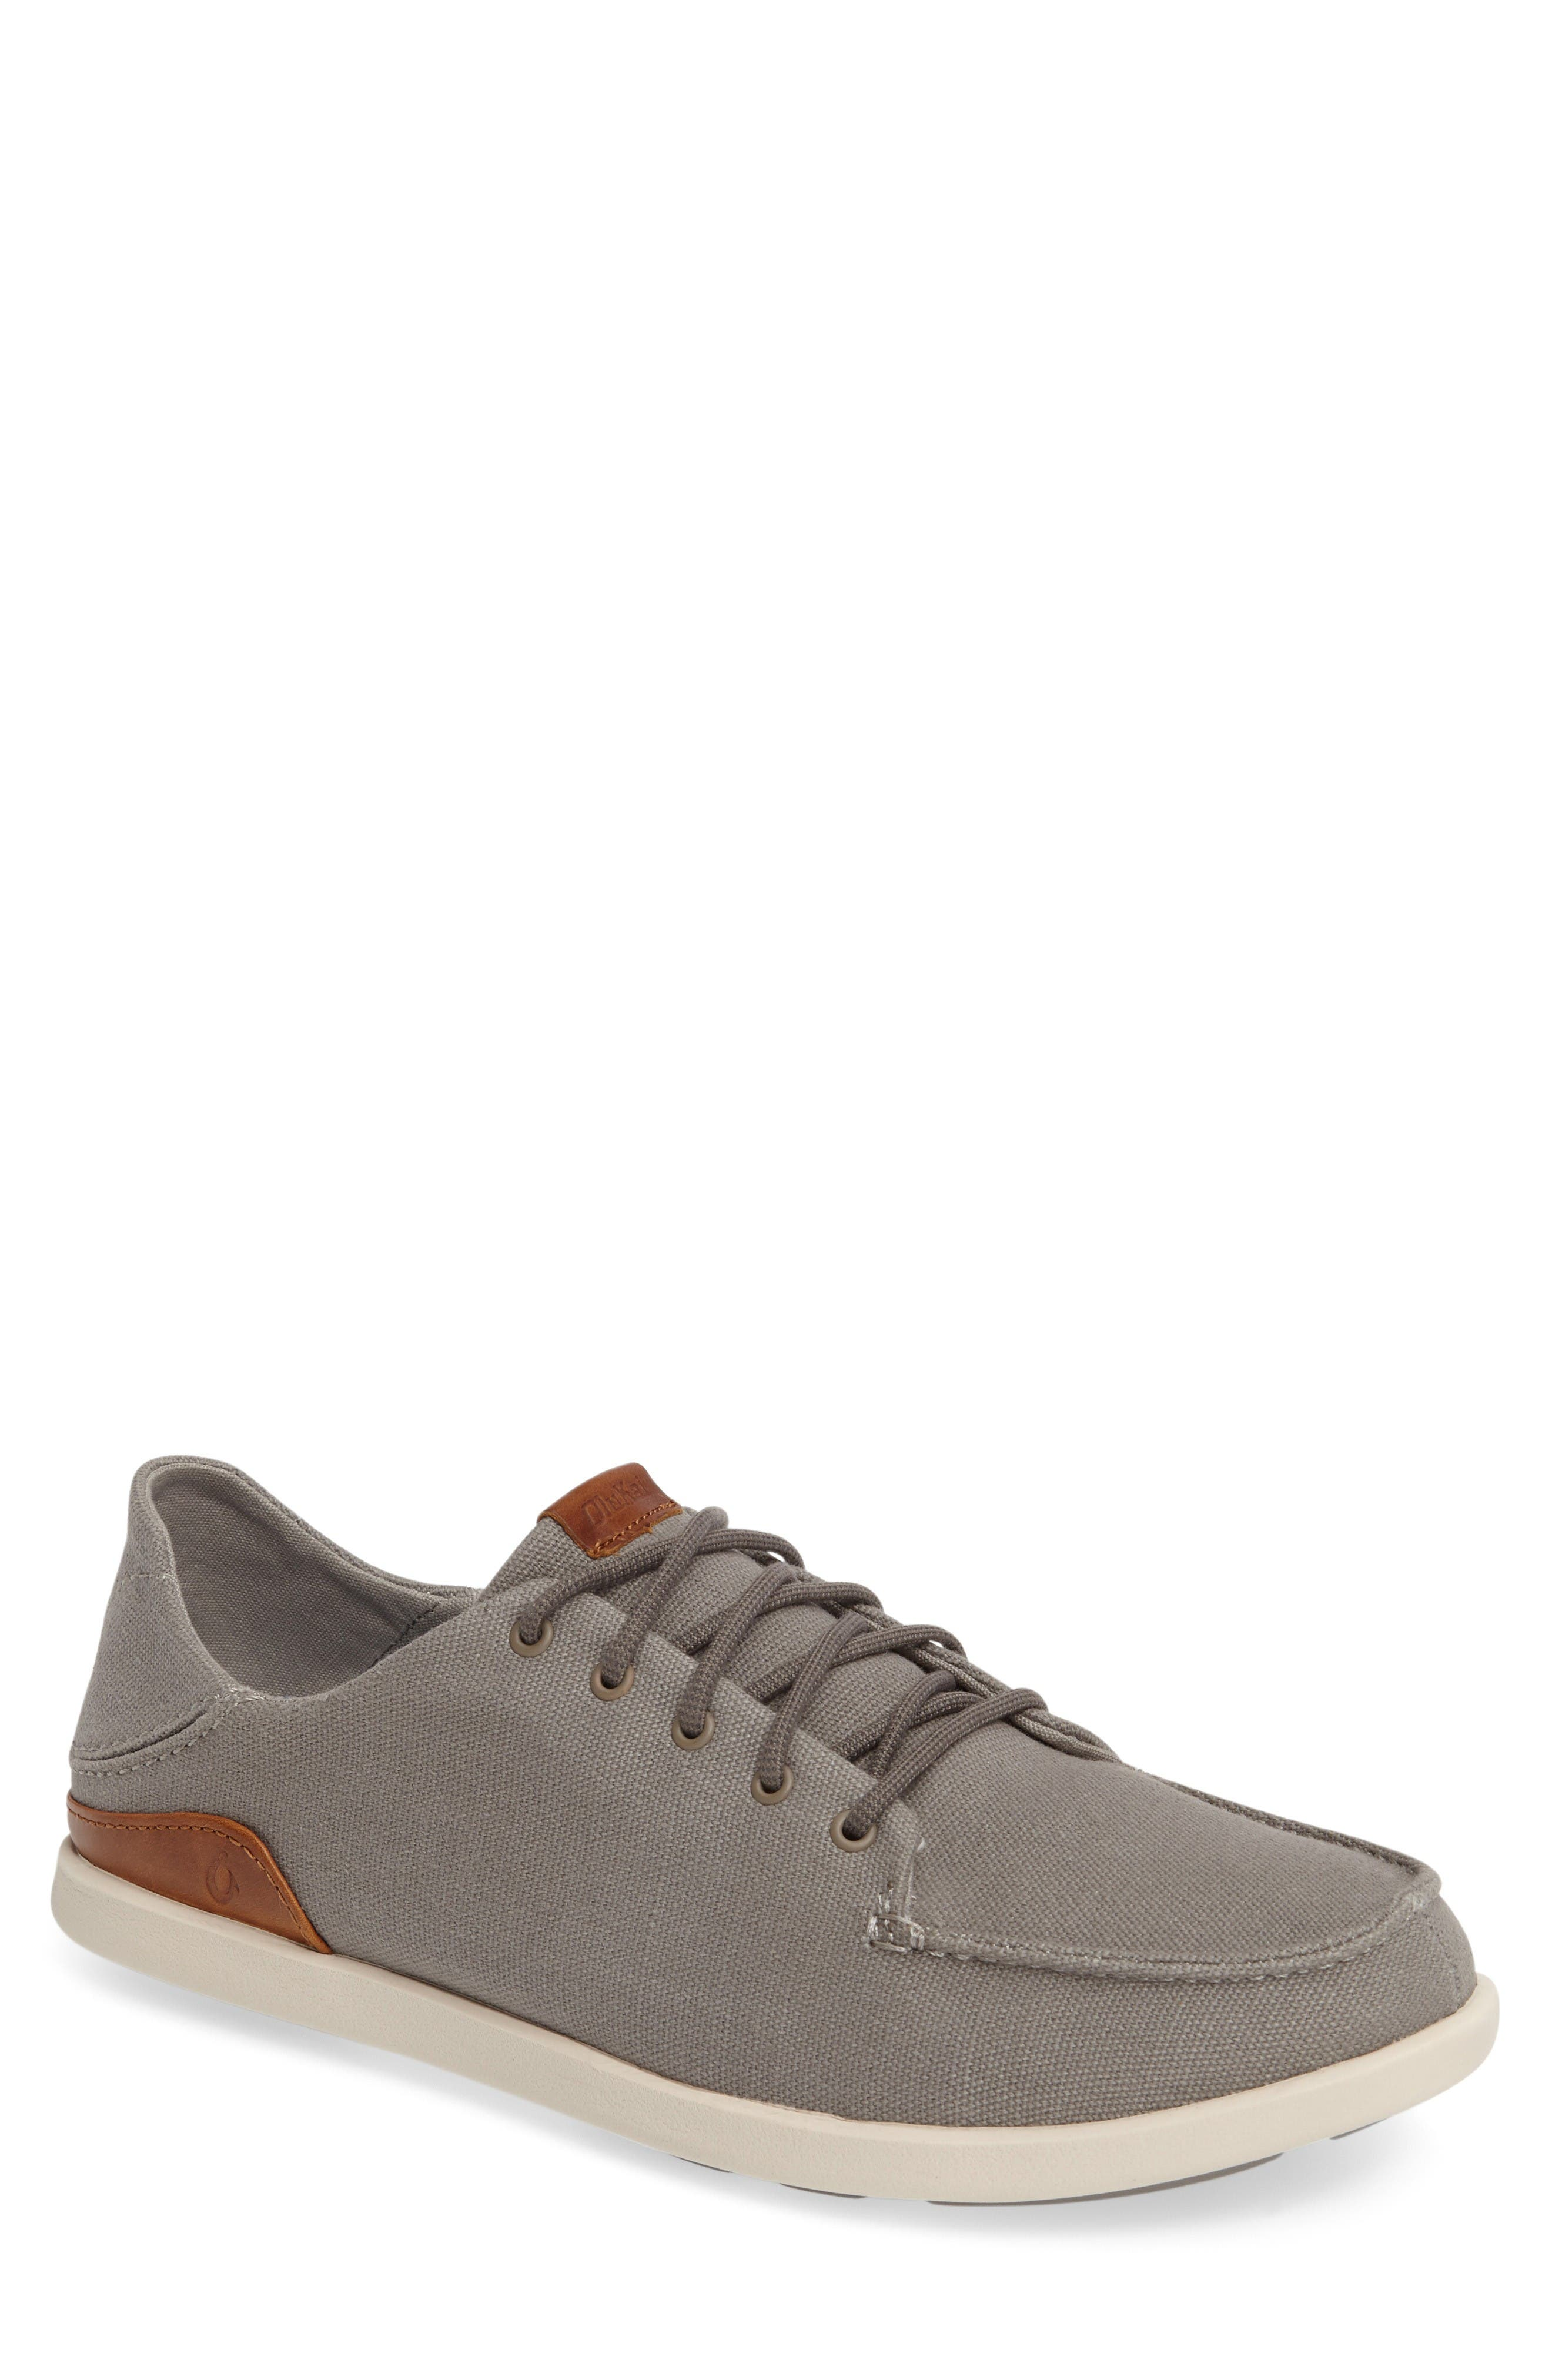 Alternate Image 1 Selected - OluKai Manoa Sneaker (Men)